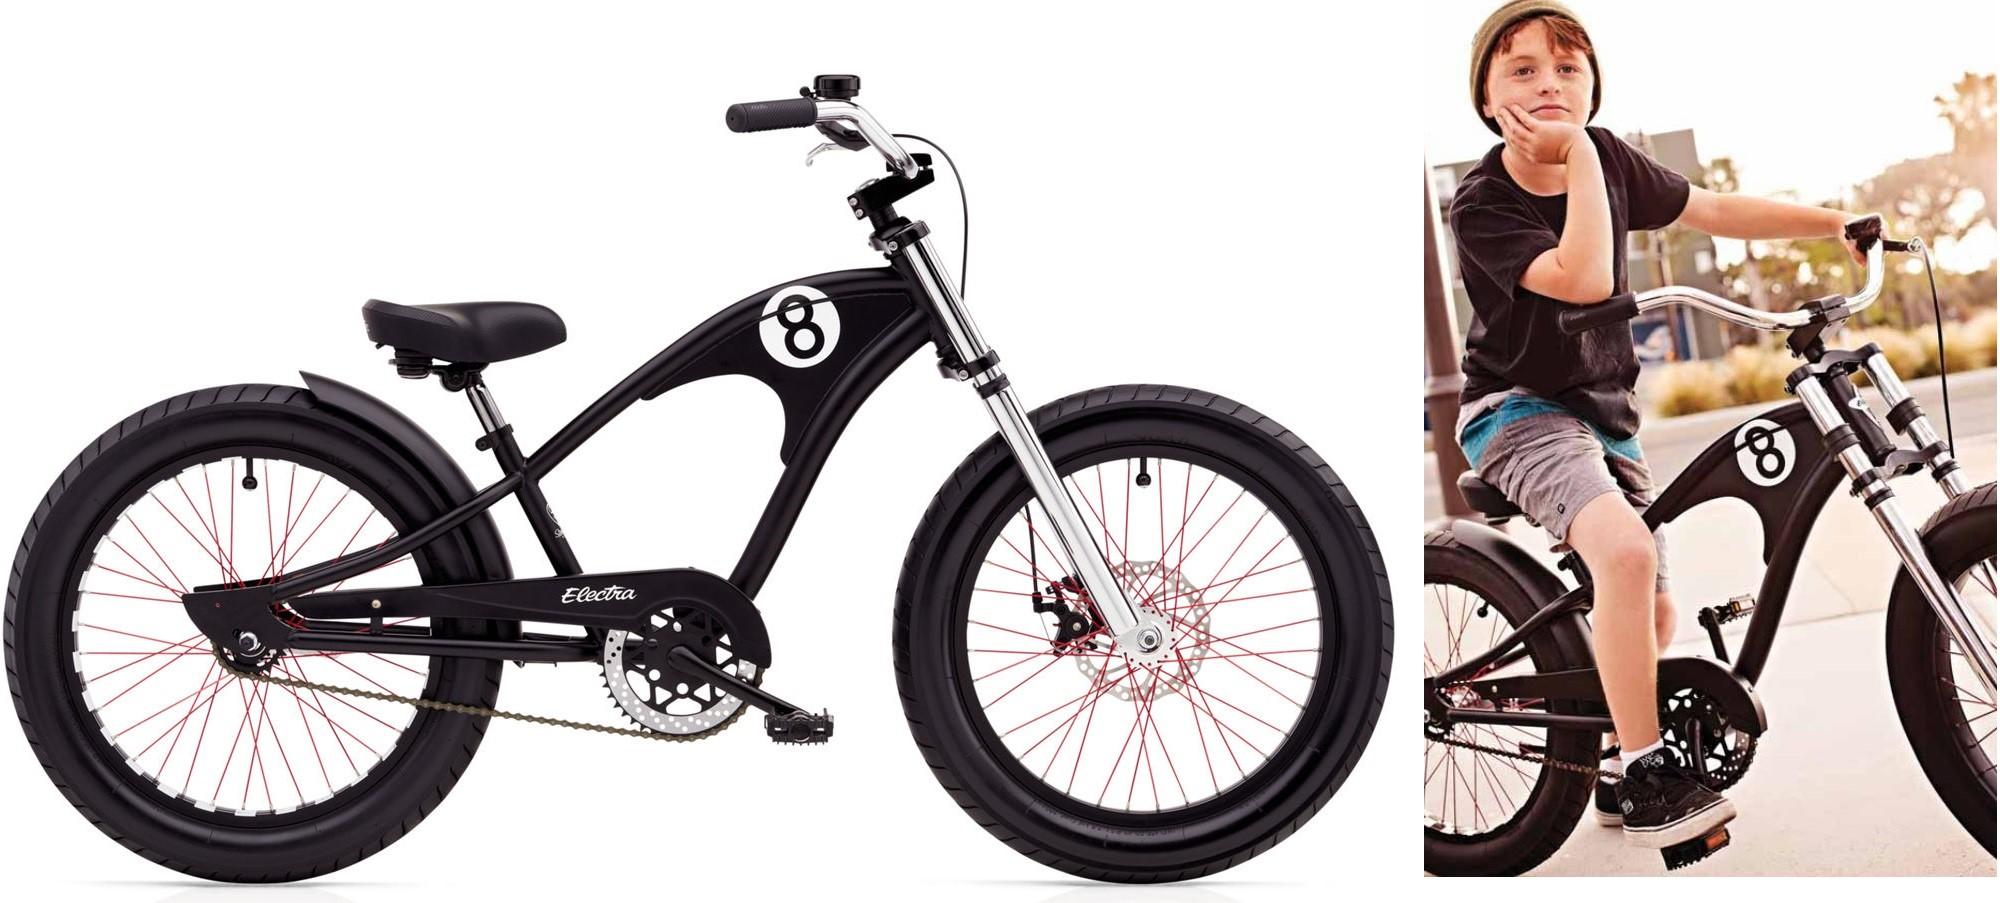 Bicykel ELECTRA Straight 8 1 Boys' Black 2018